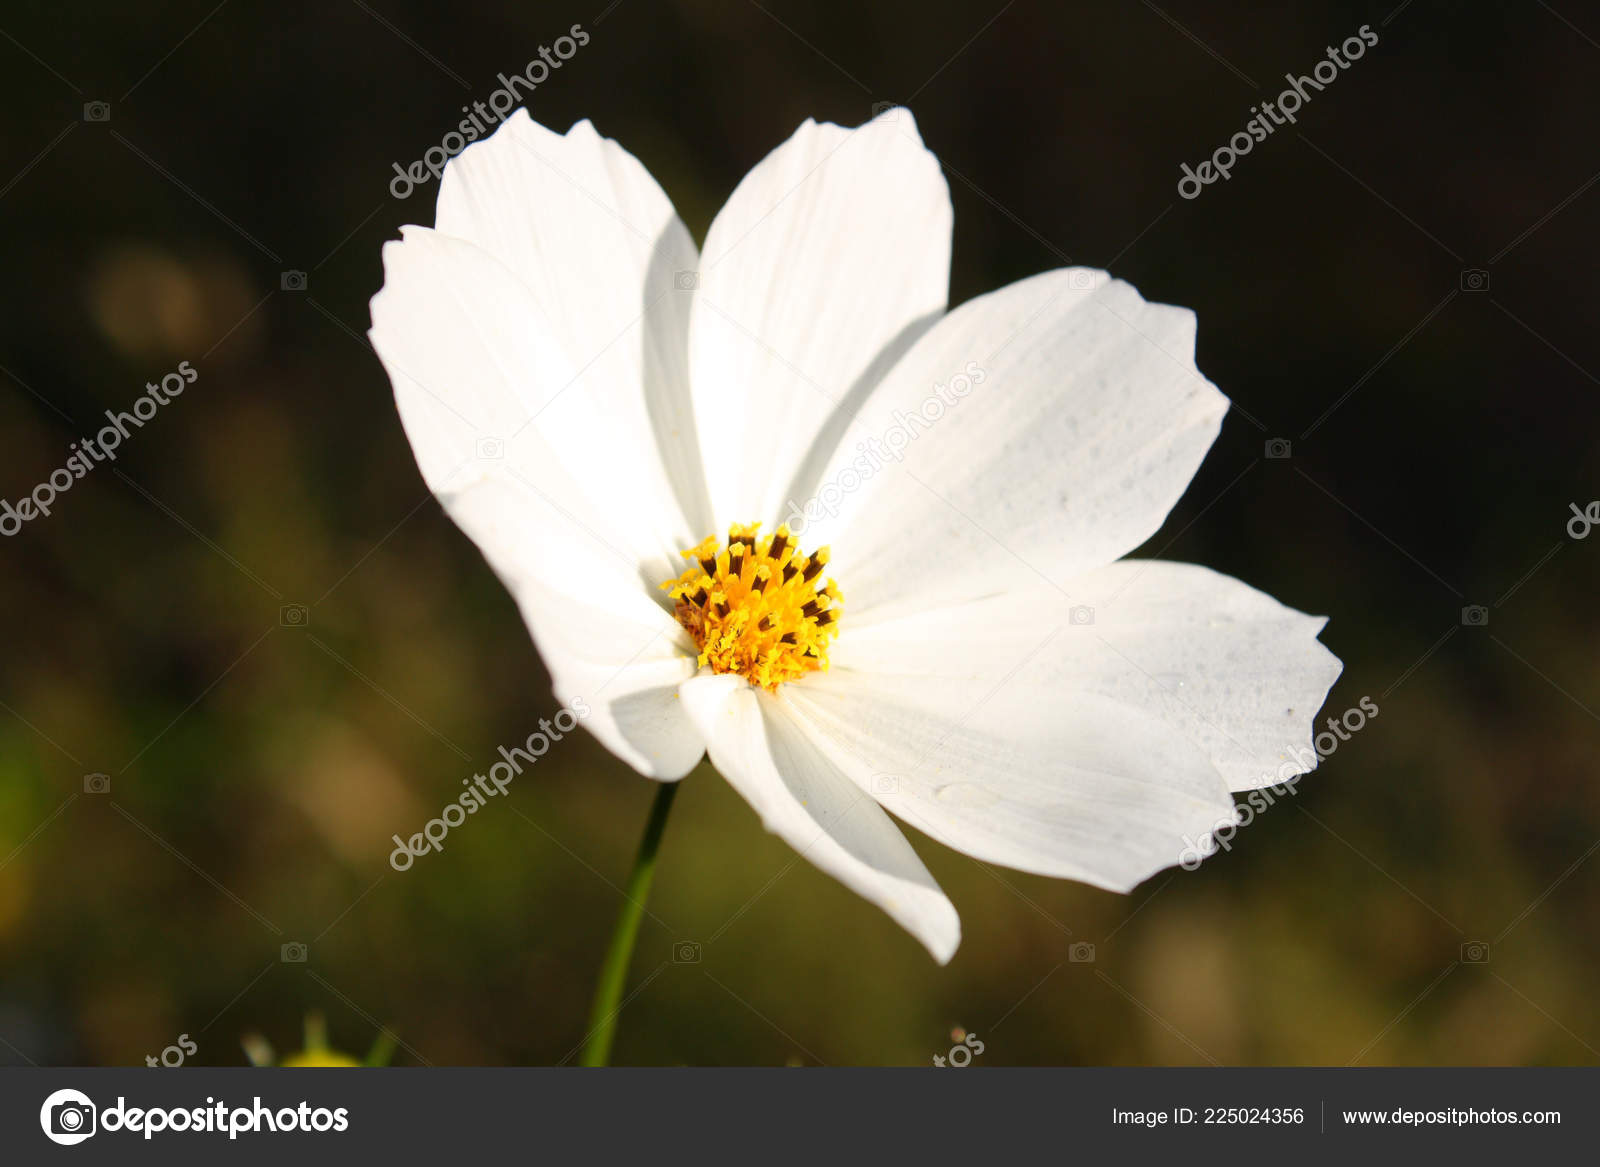 Closeup White Cosmos Flower Stock Photo Daizuoxin 225024356